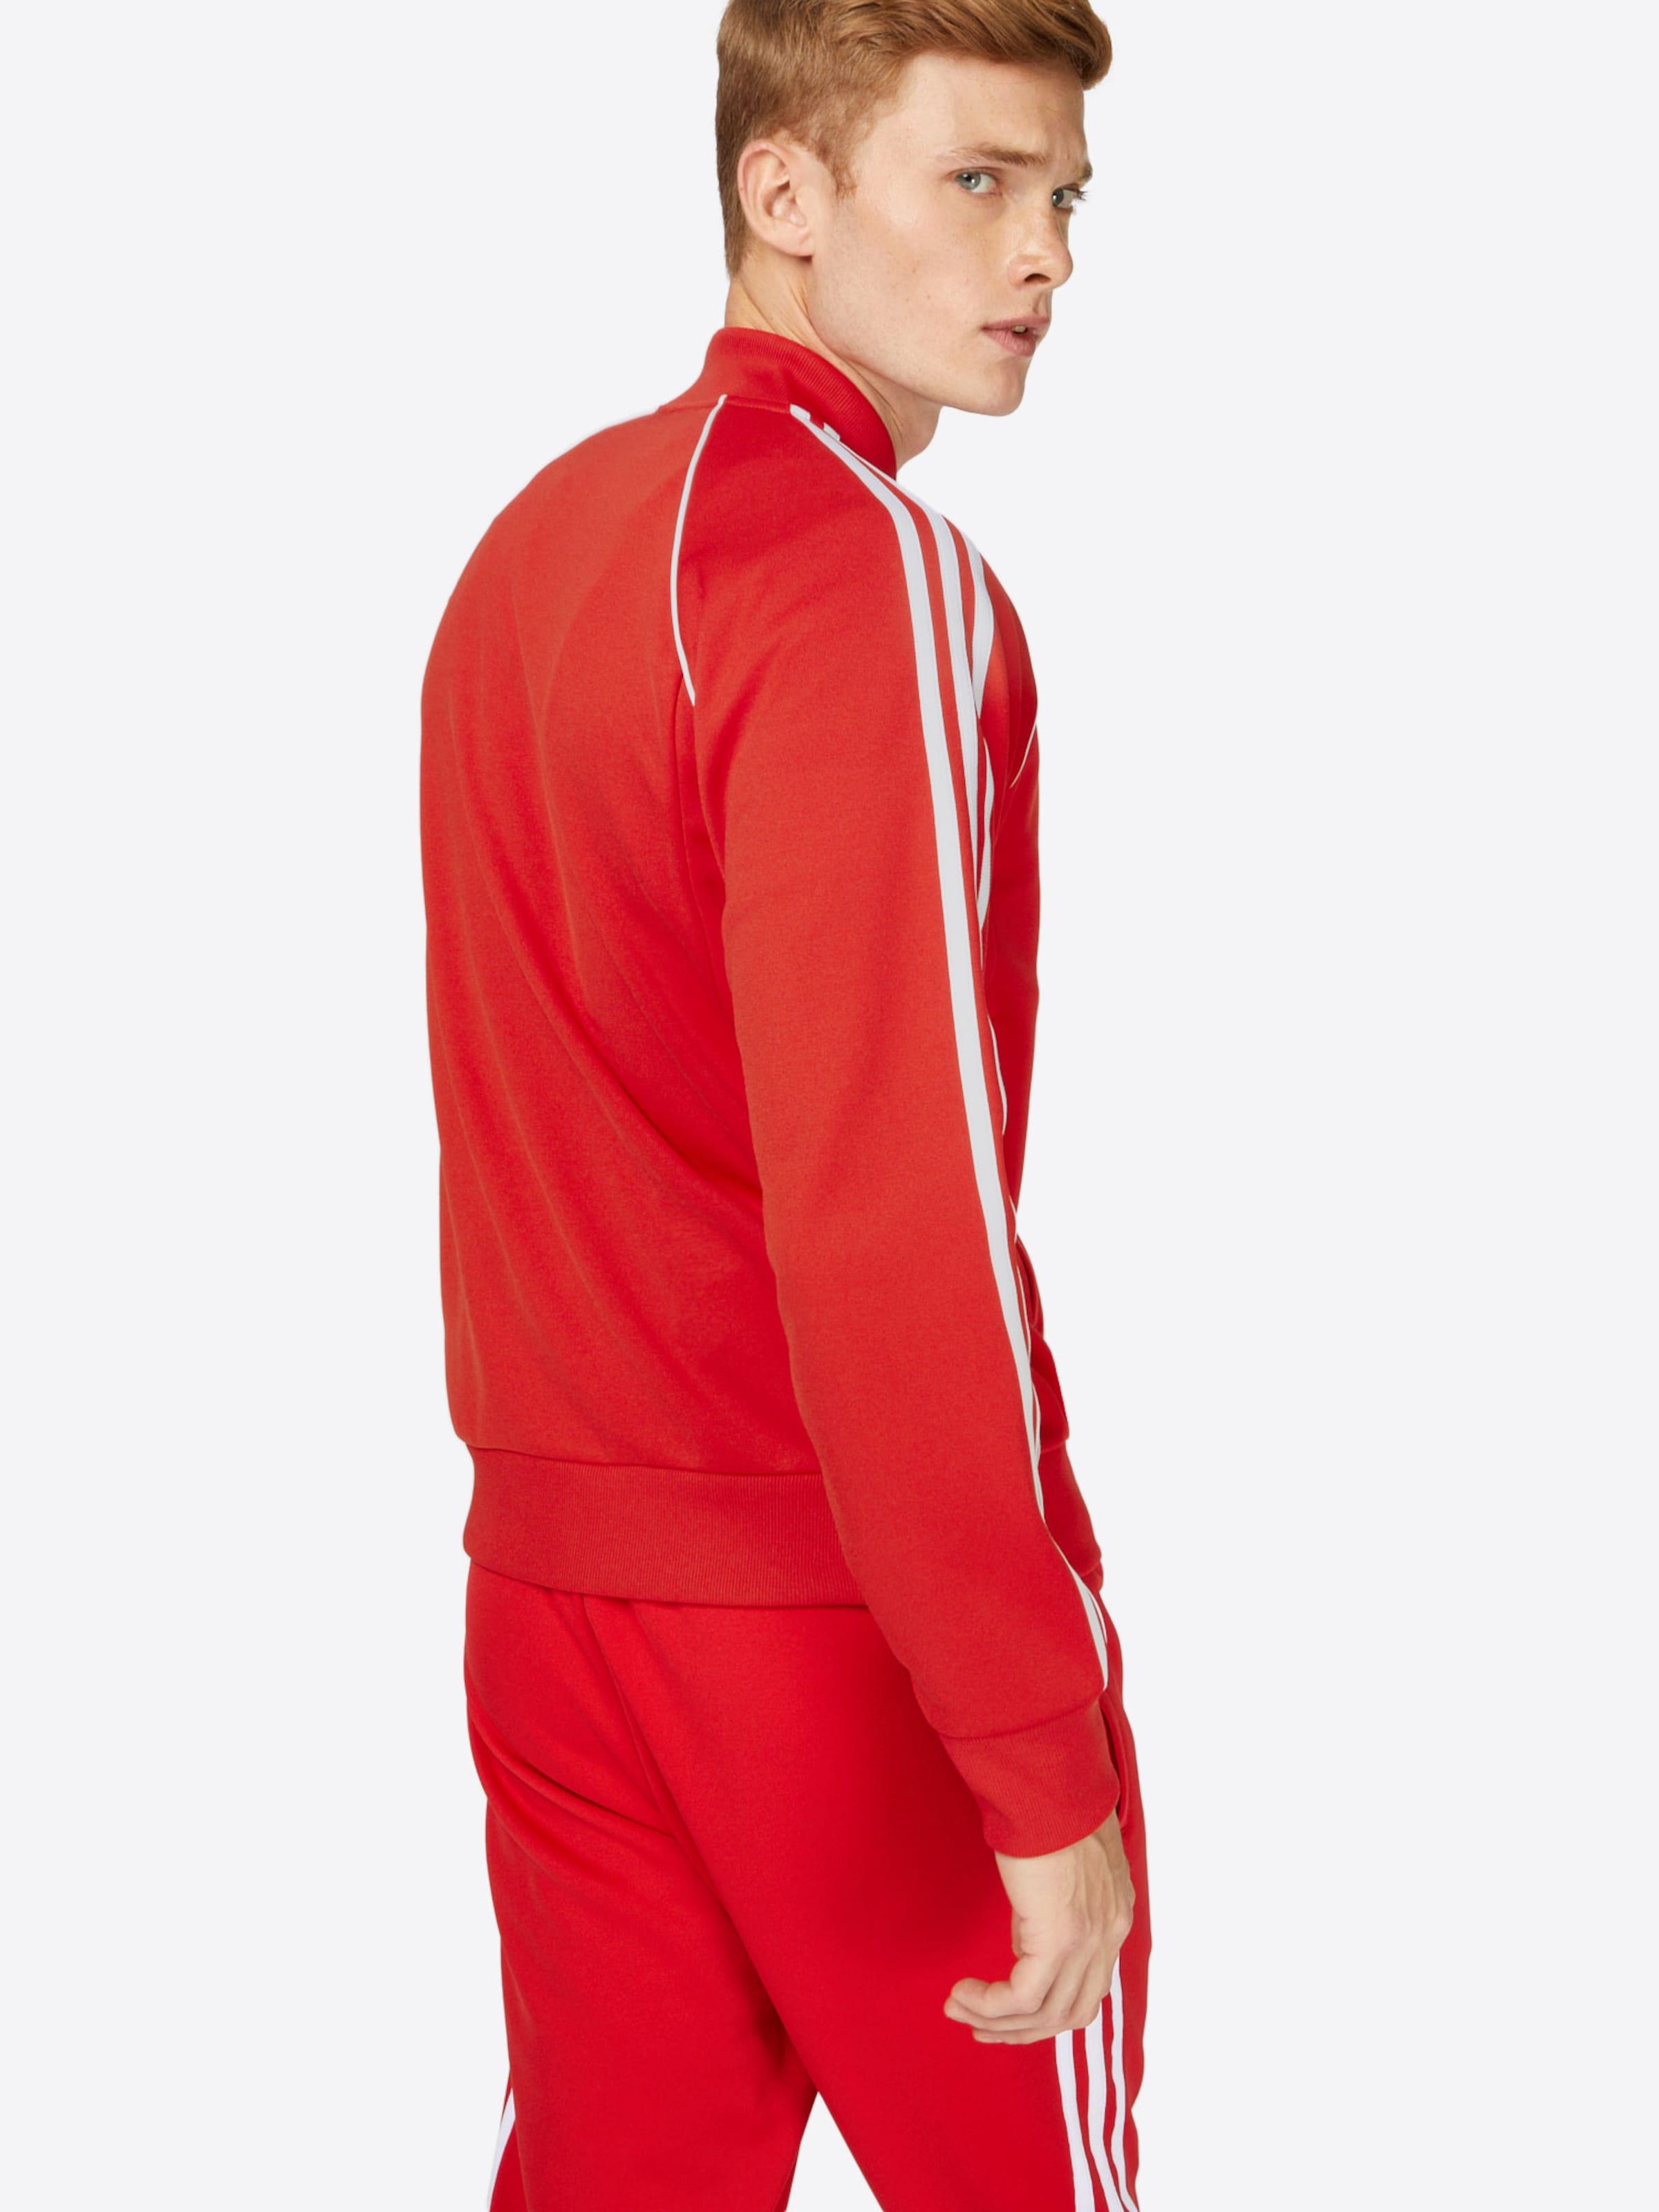 'sst saison Tracktop' Veste Mi RougeBlanc Originals Adidas En wO08Nvnm